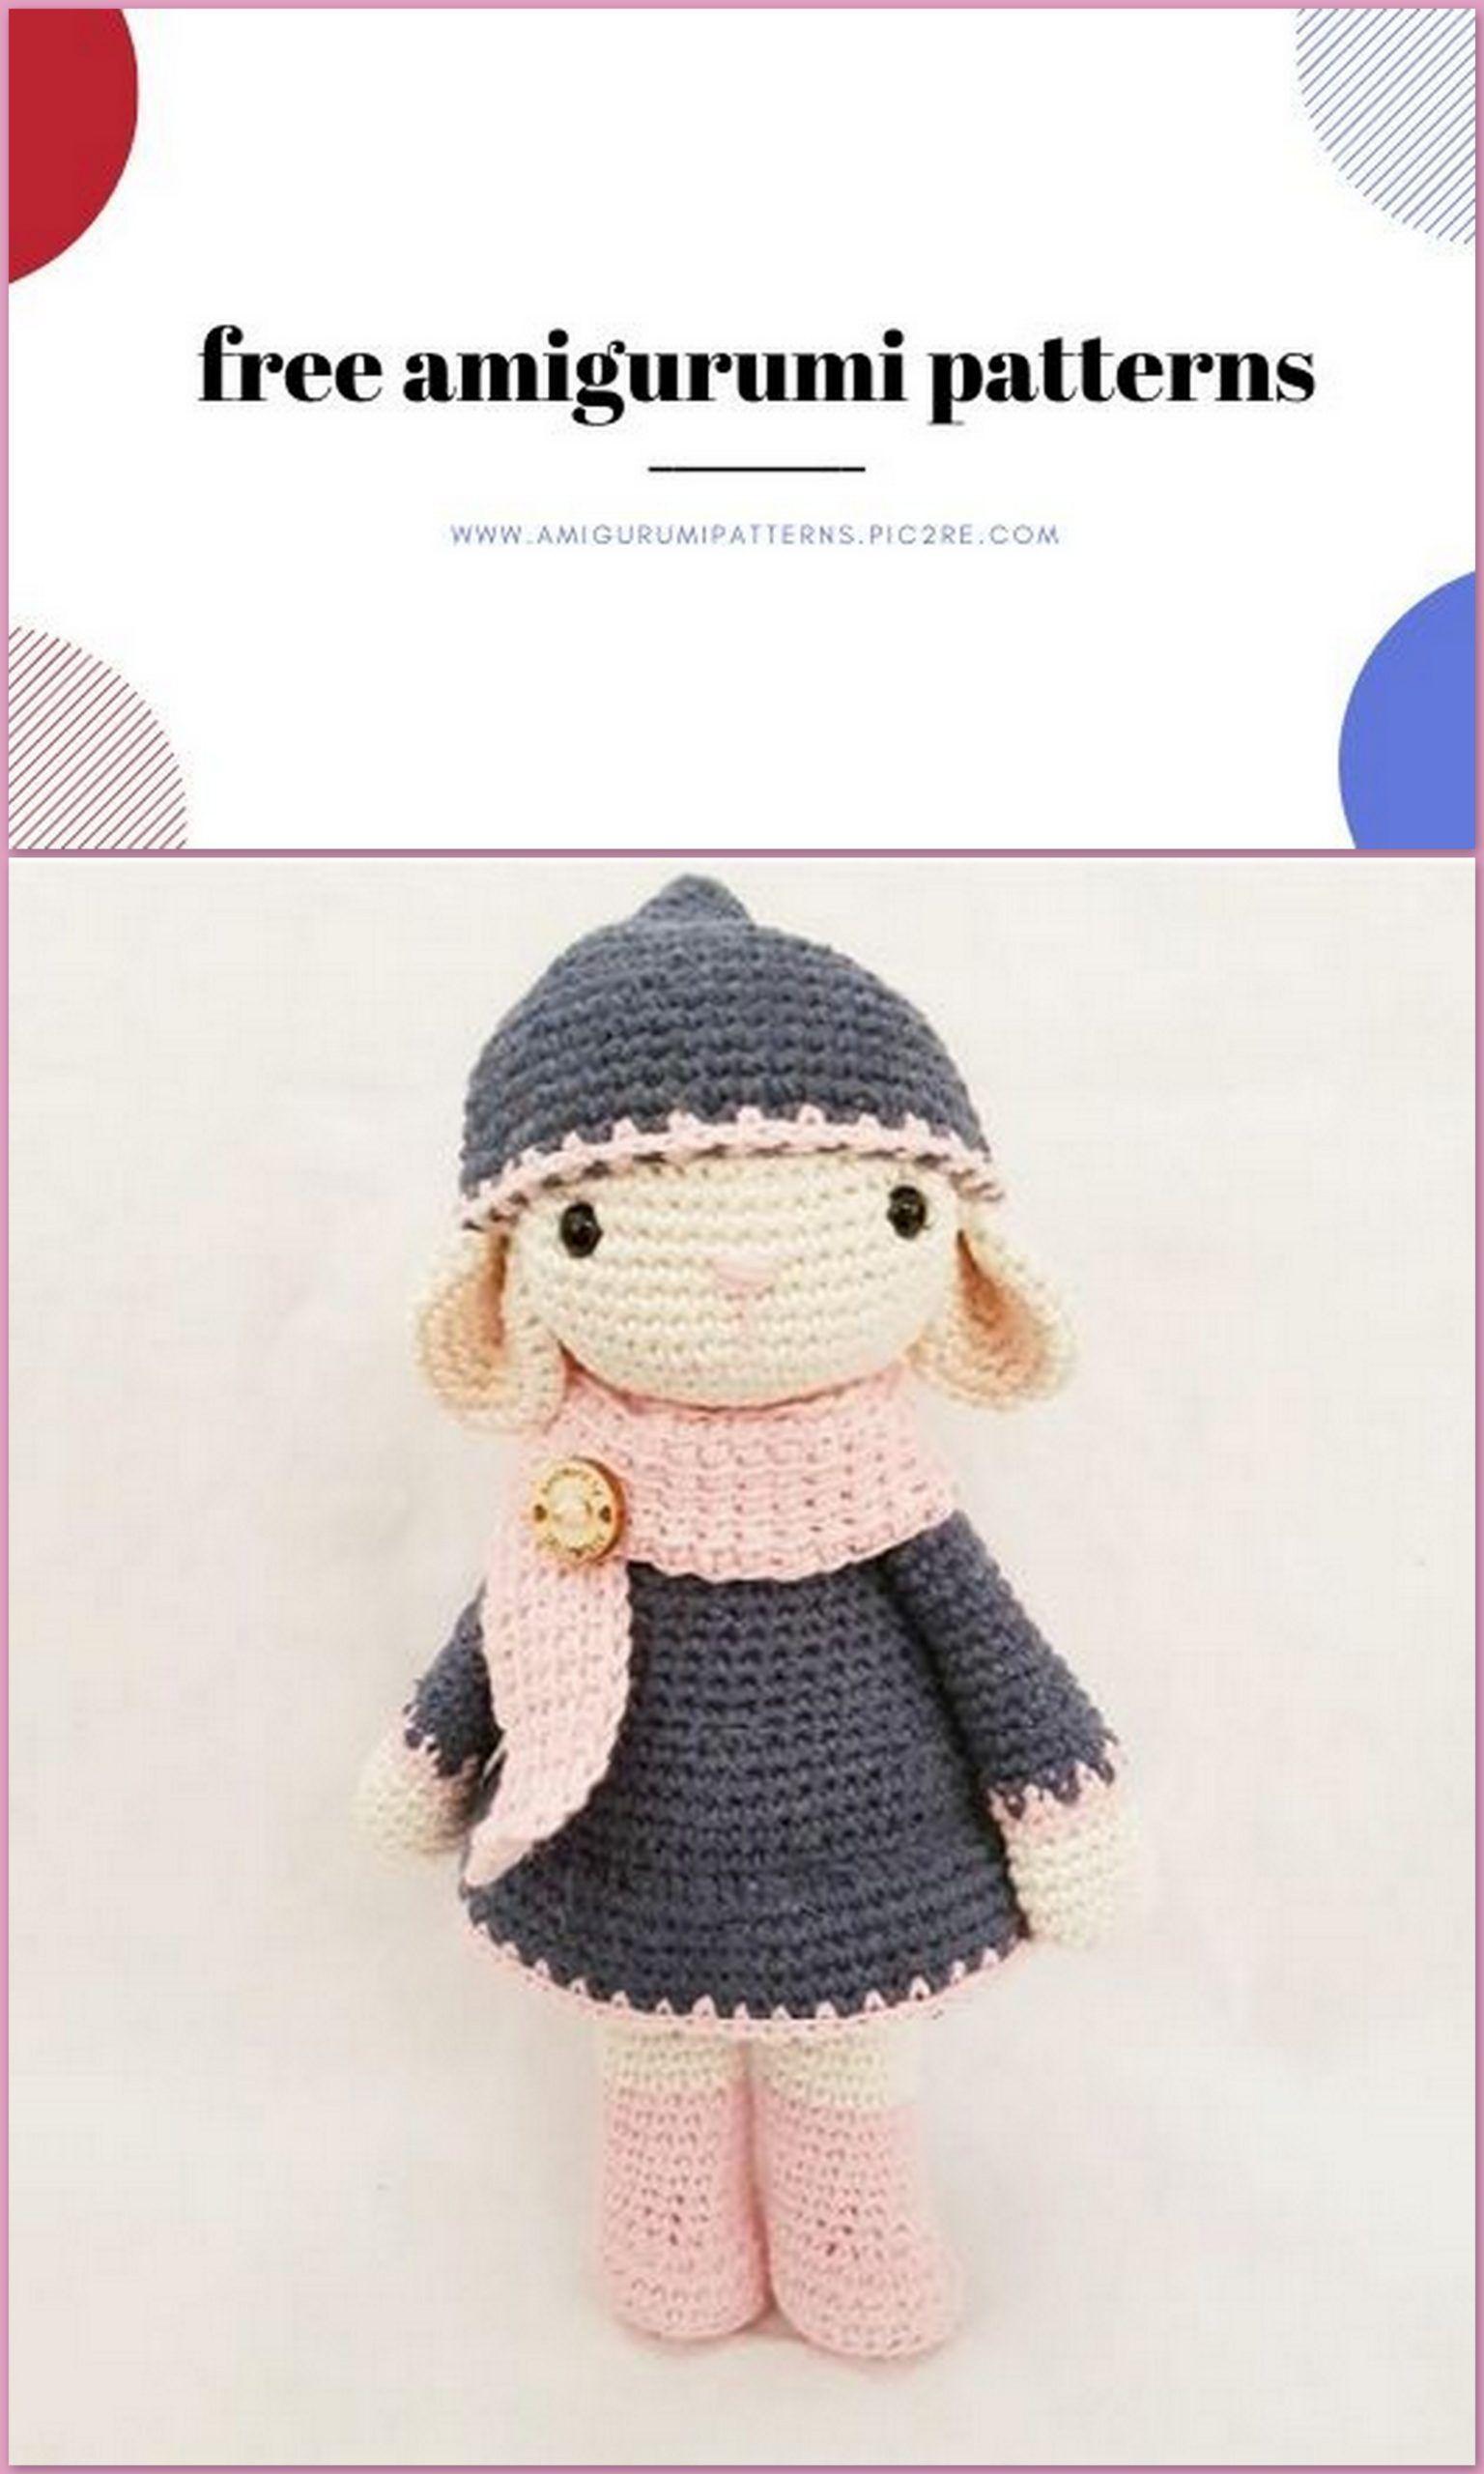 Let's Make Baby Toys Rattle 5pc Crochet Star Amigurumi 0 12 Months ... | 2560x1536